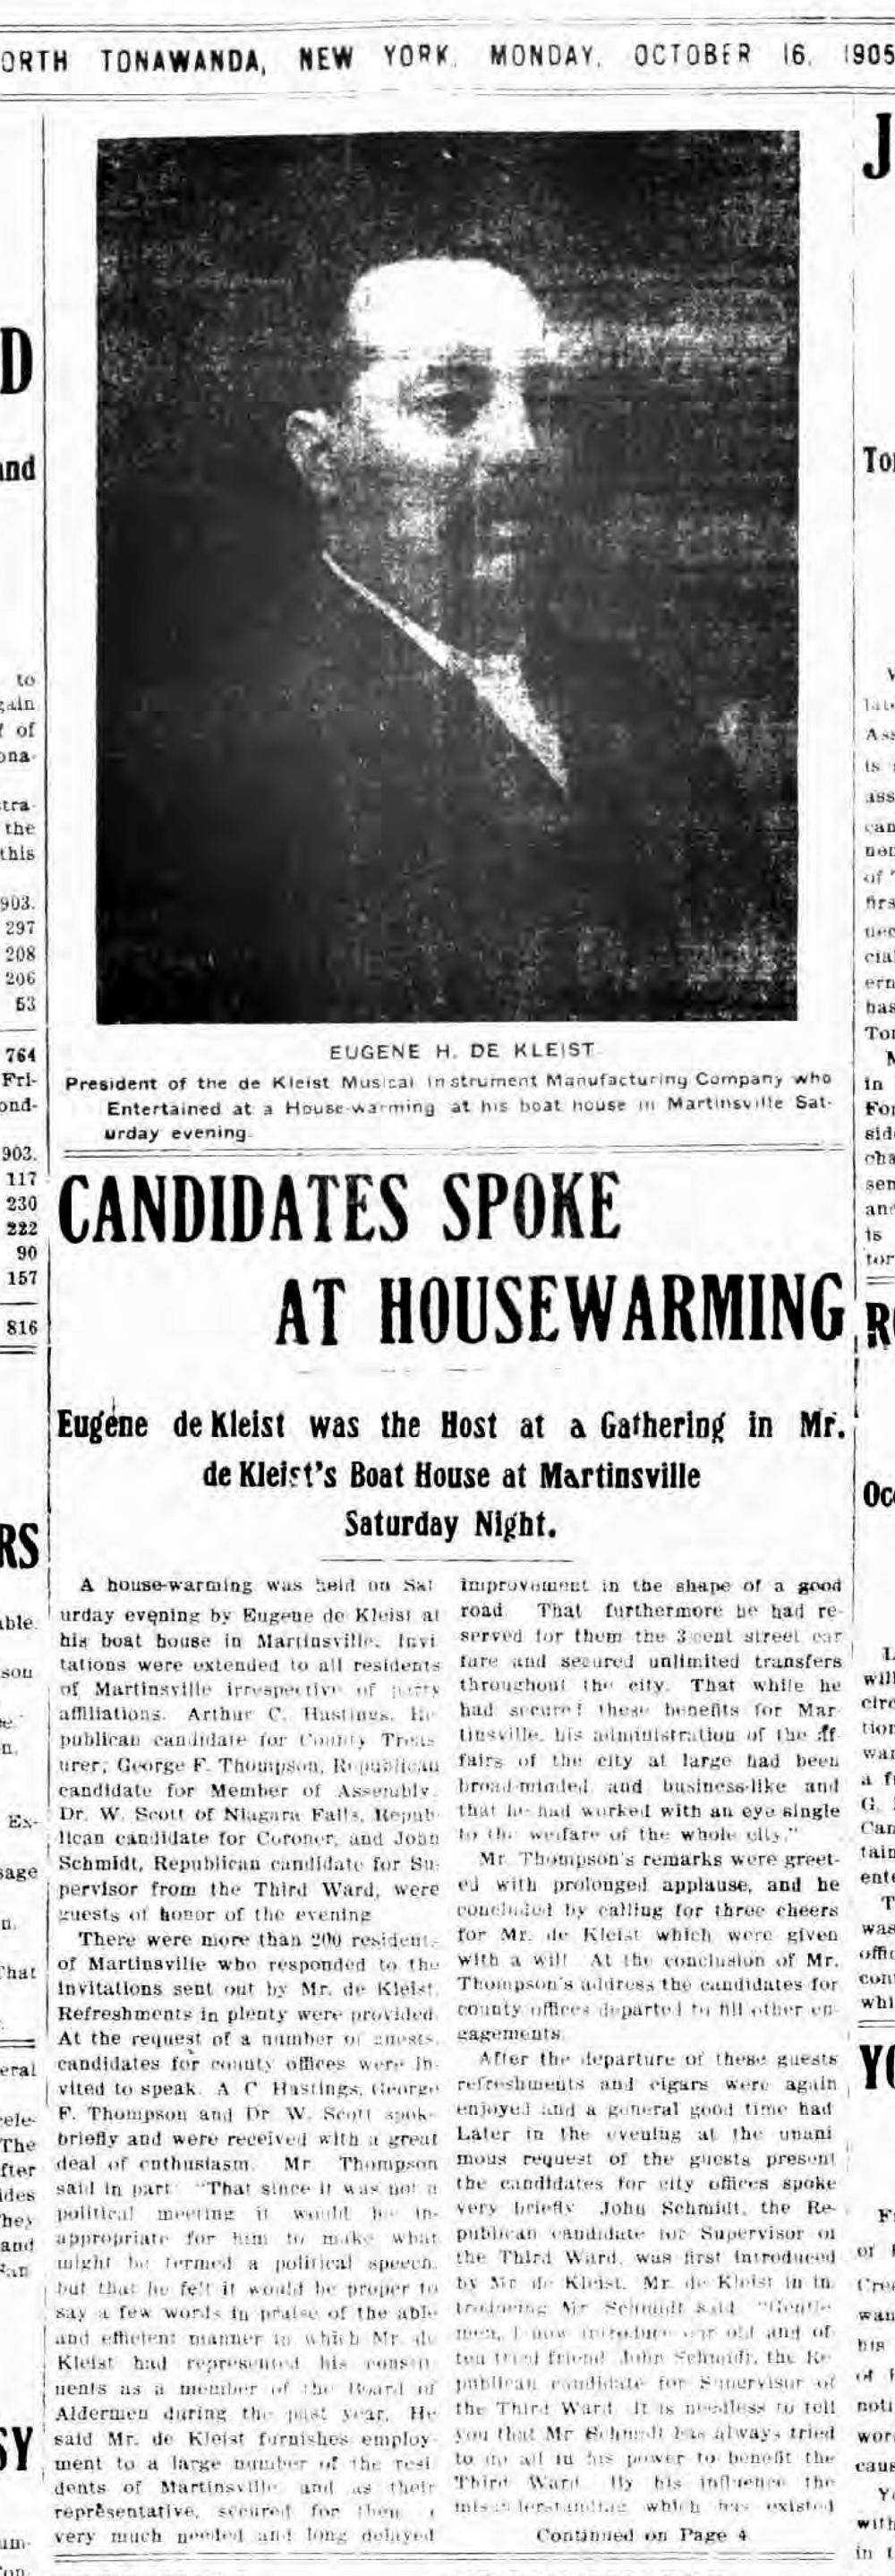 Candidates Speak at Boathouse, de Kleist photo, article (Tonawanda News, 1905-10-13).jpg